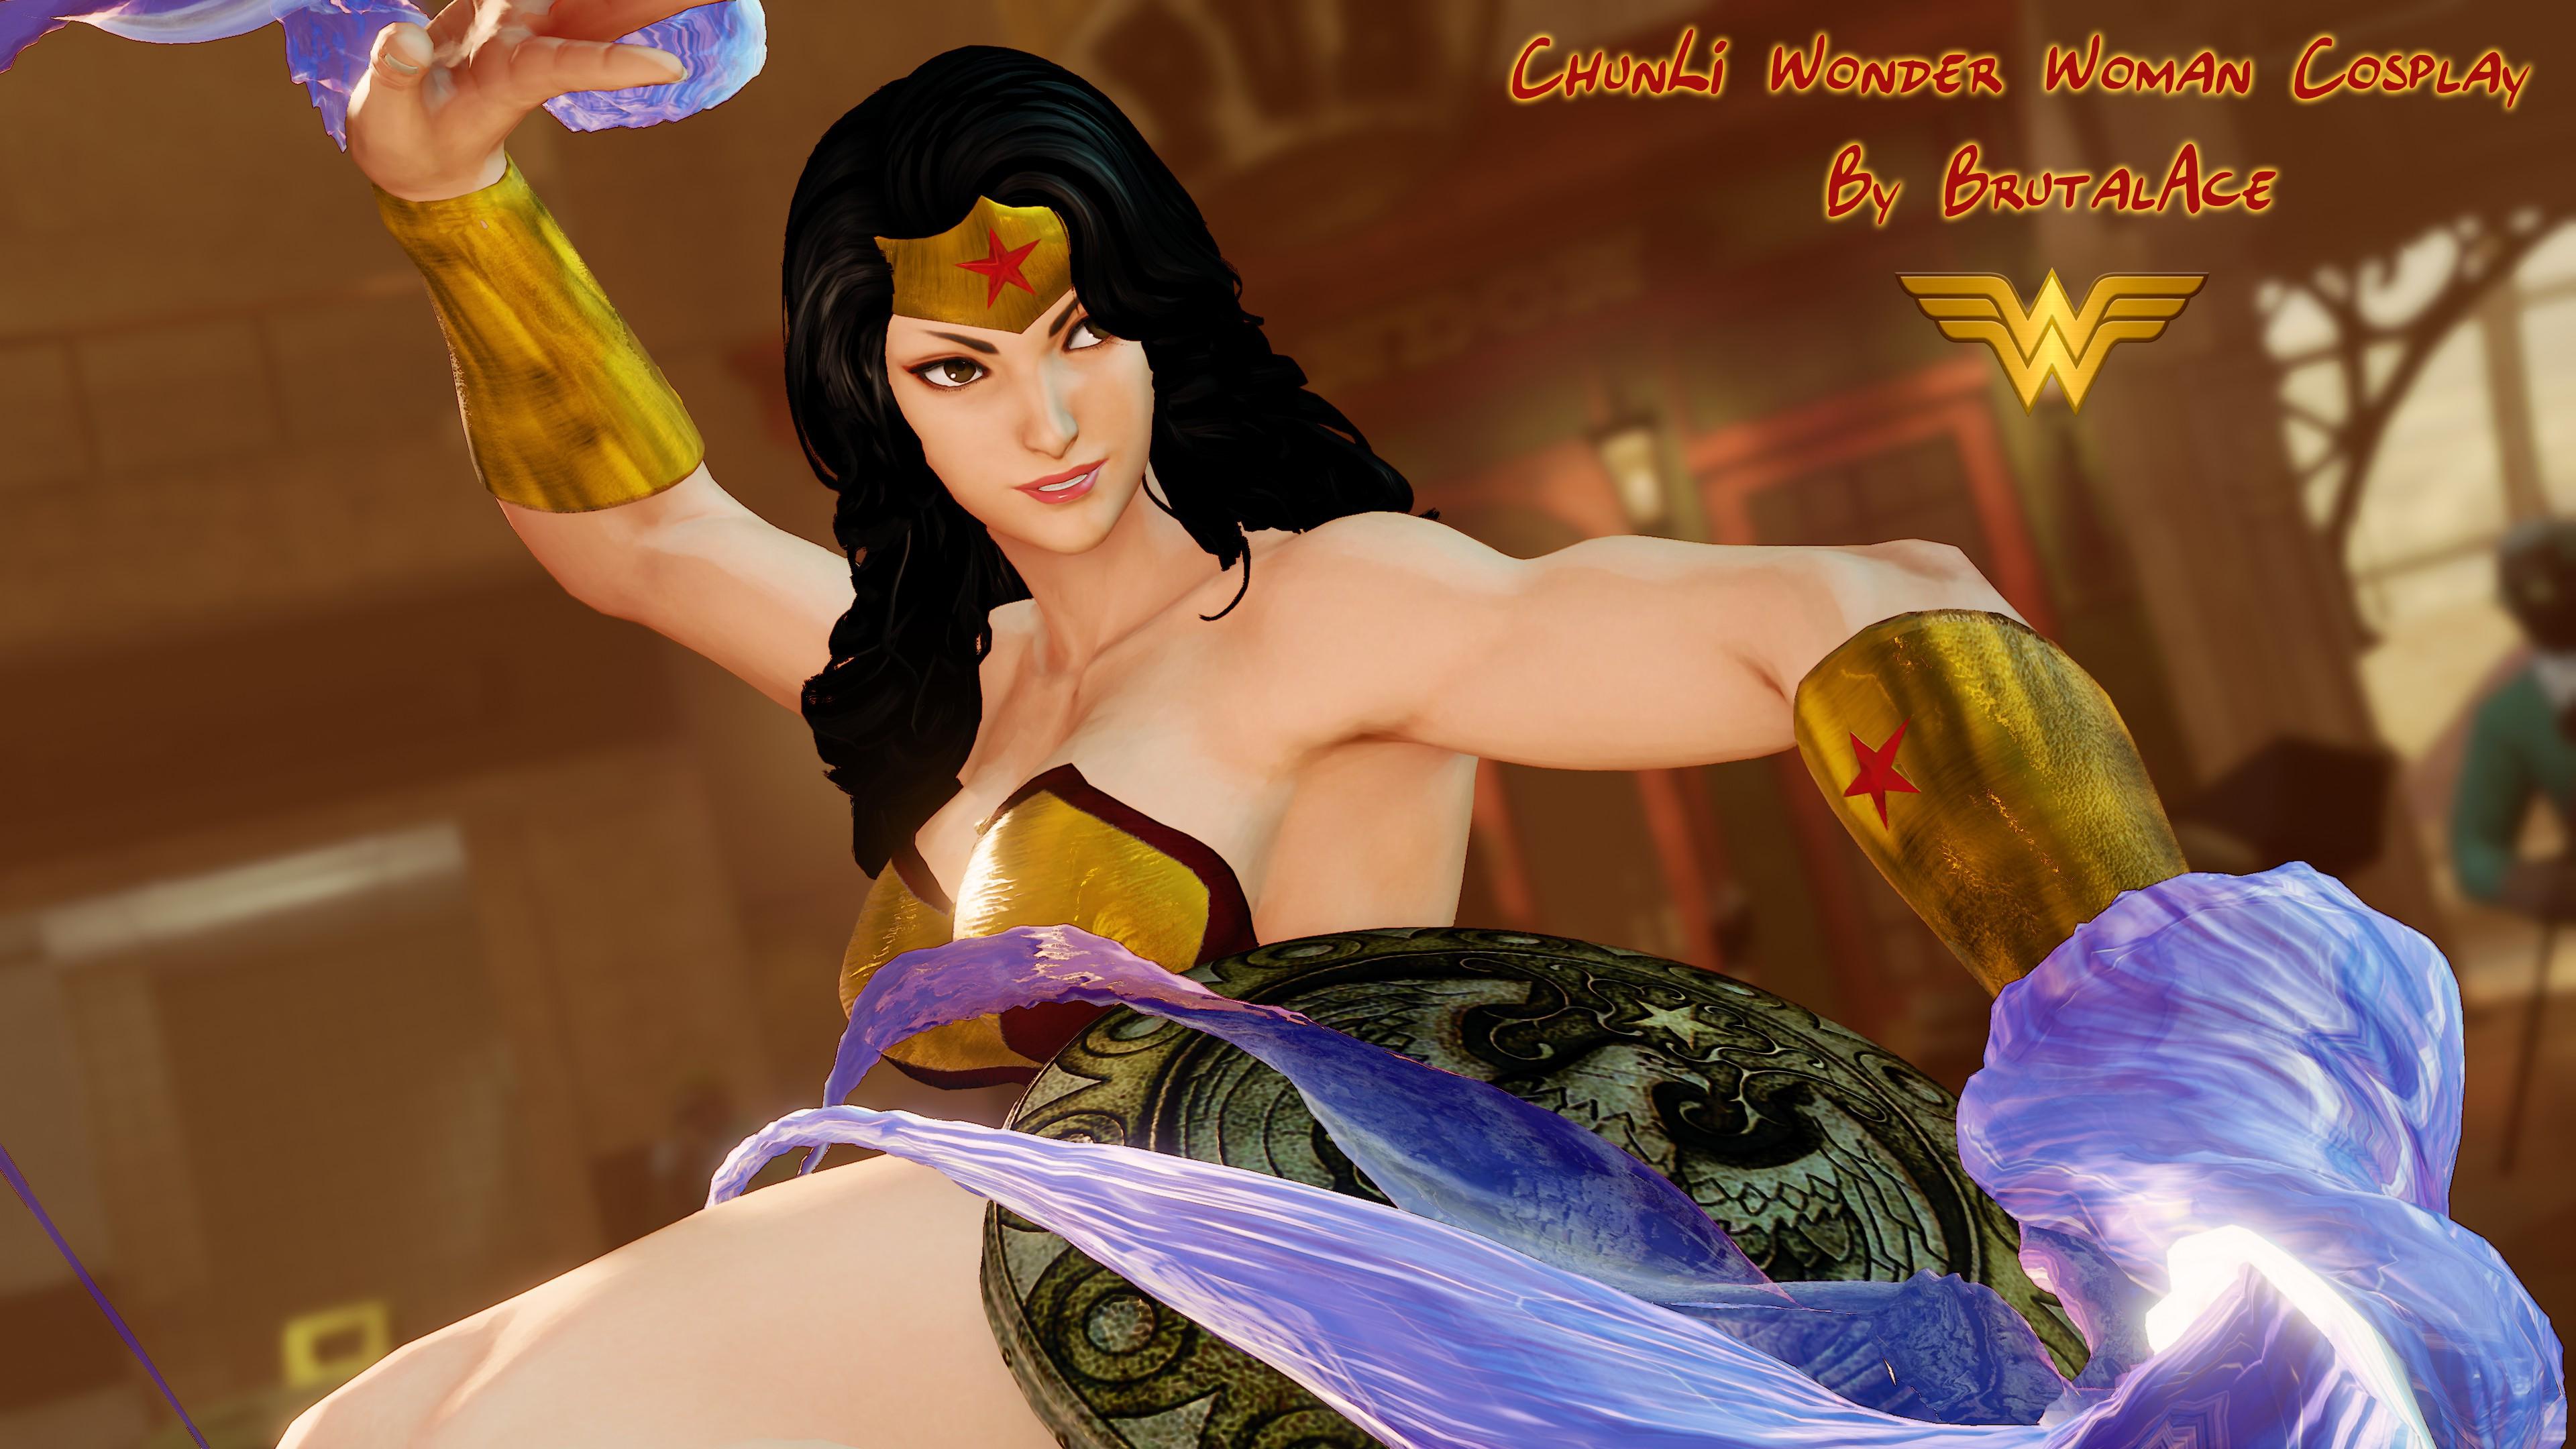 Chunli Wonder Woman Cosplay